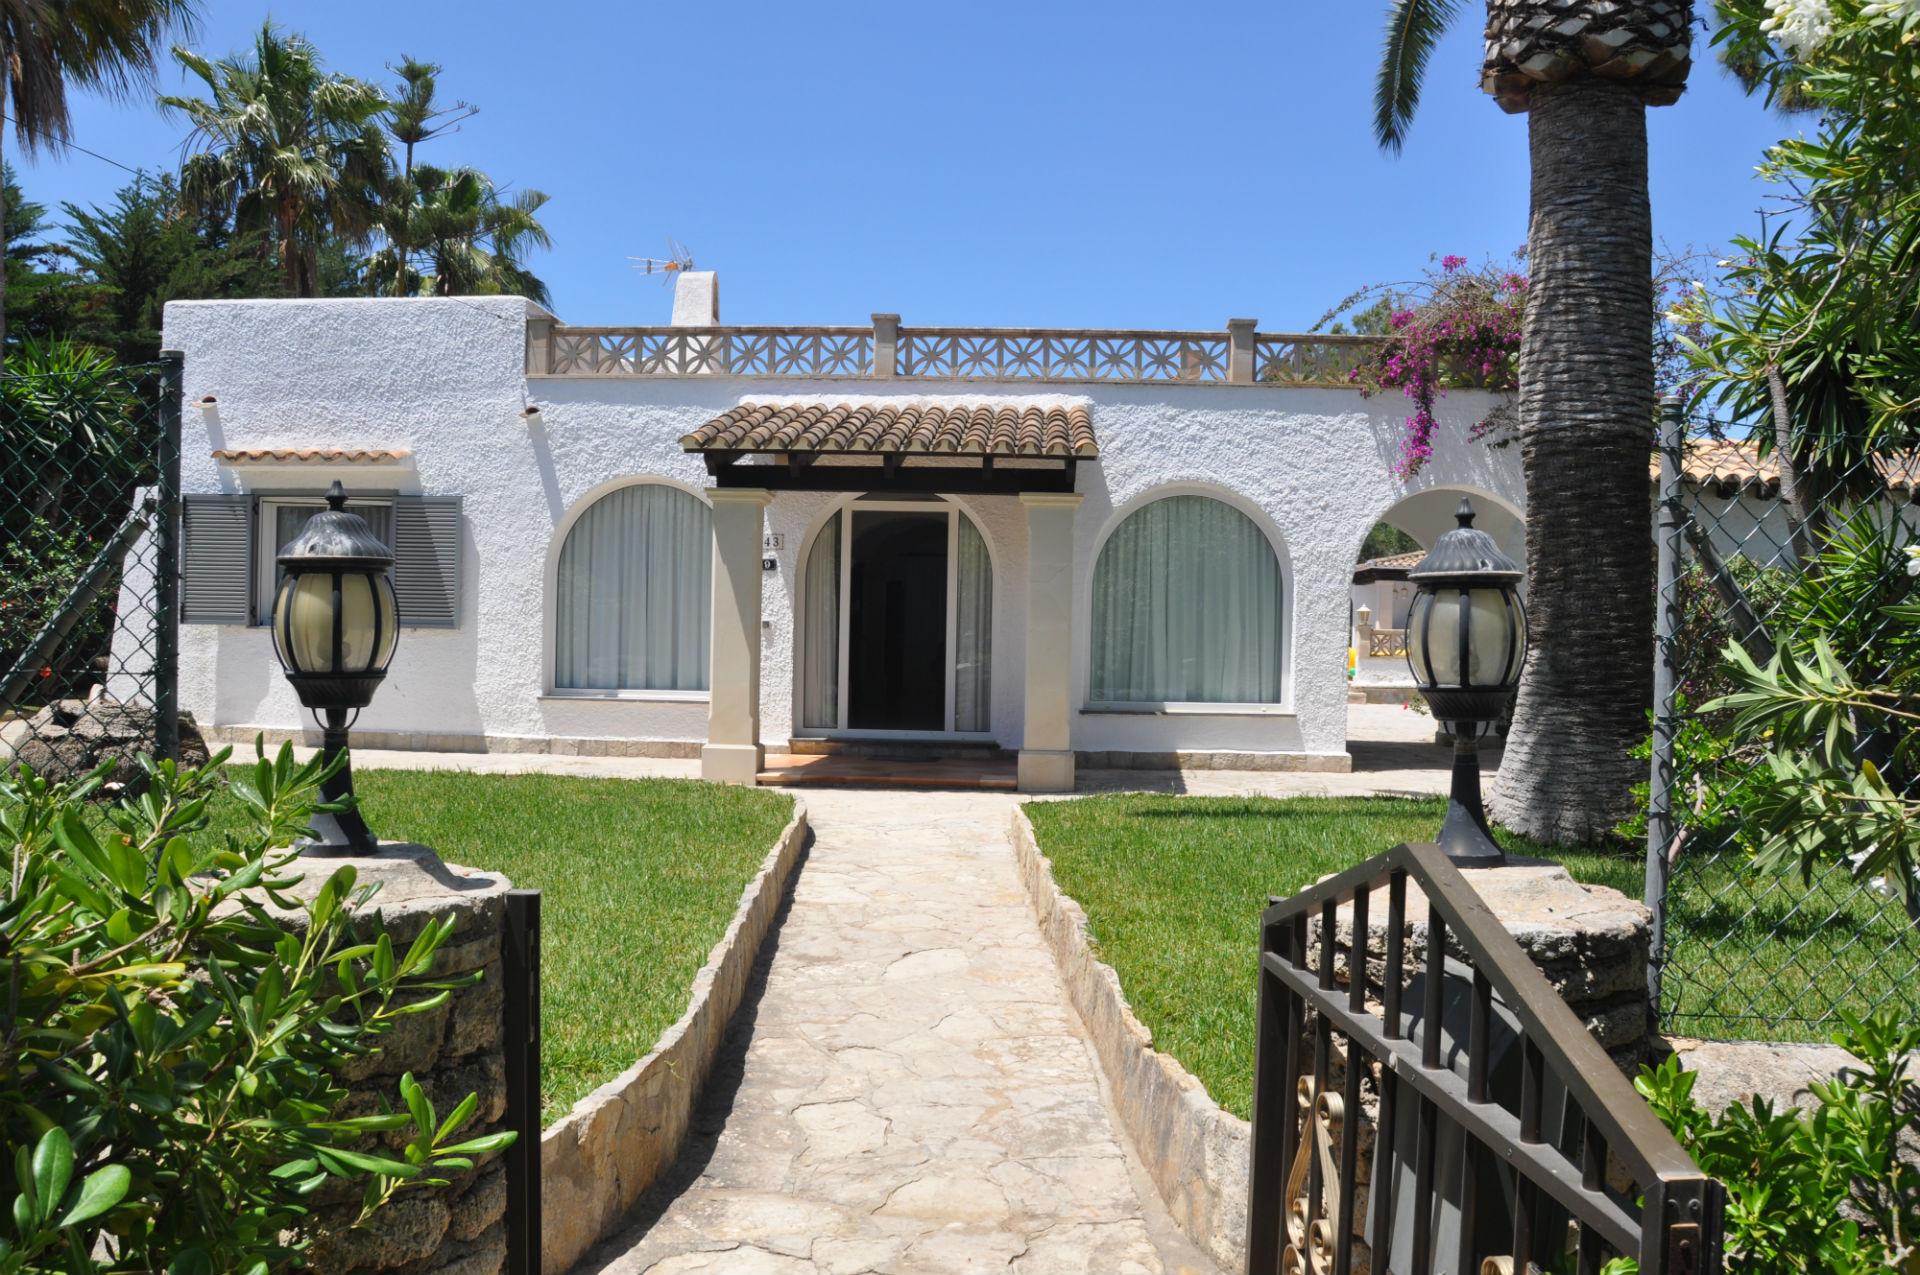 52 Villa Juliette